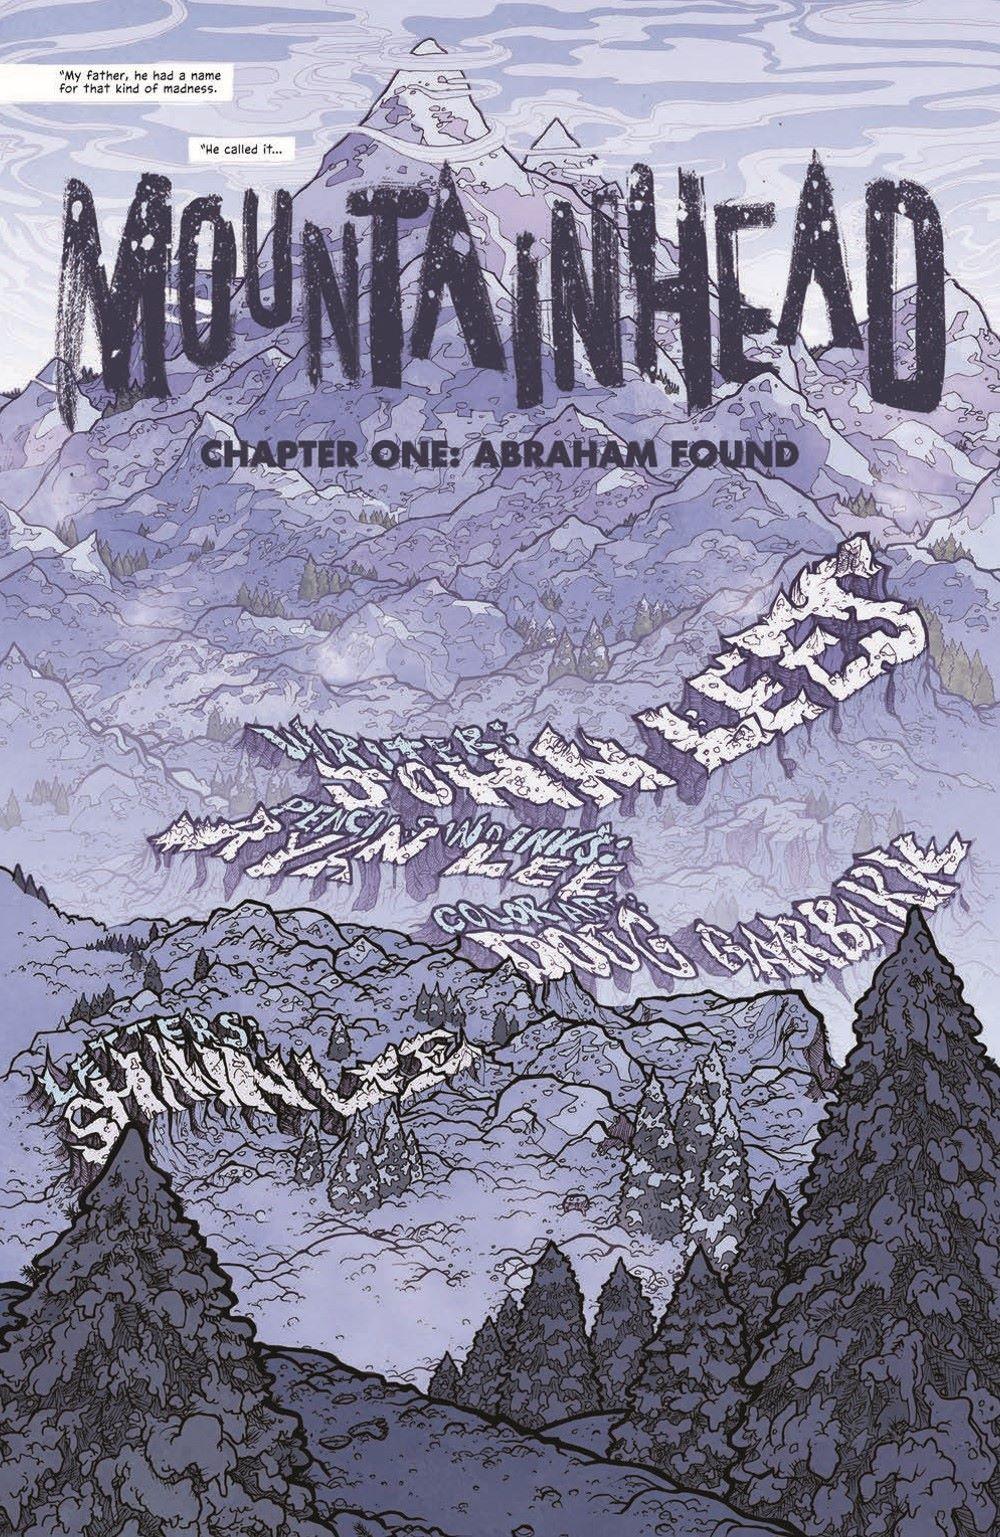 MTNH-TPB_pr-5 ComicList Previews: MOUNTAINHEAD VOLUME 1 TP